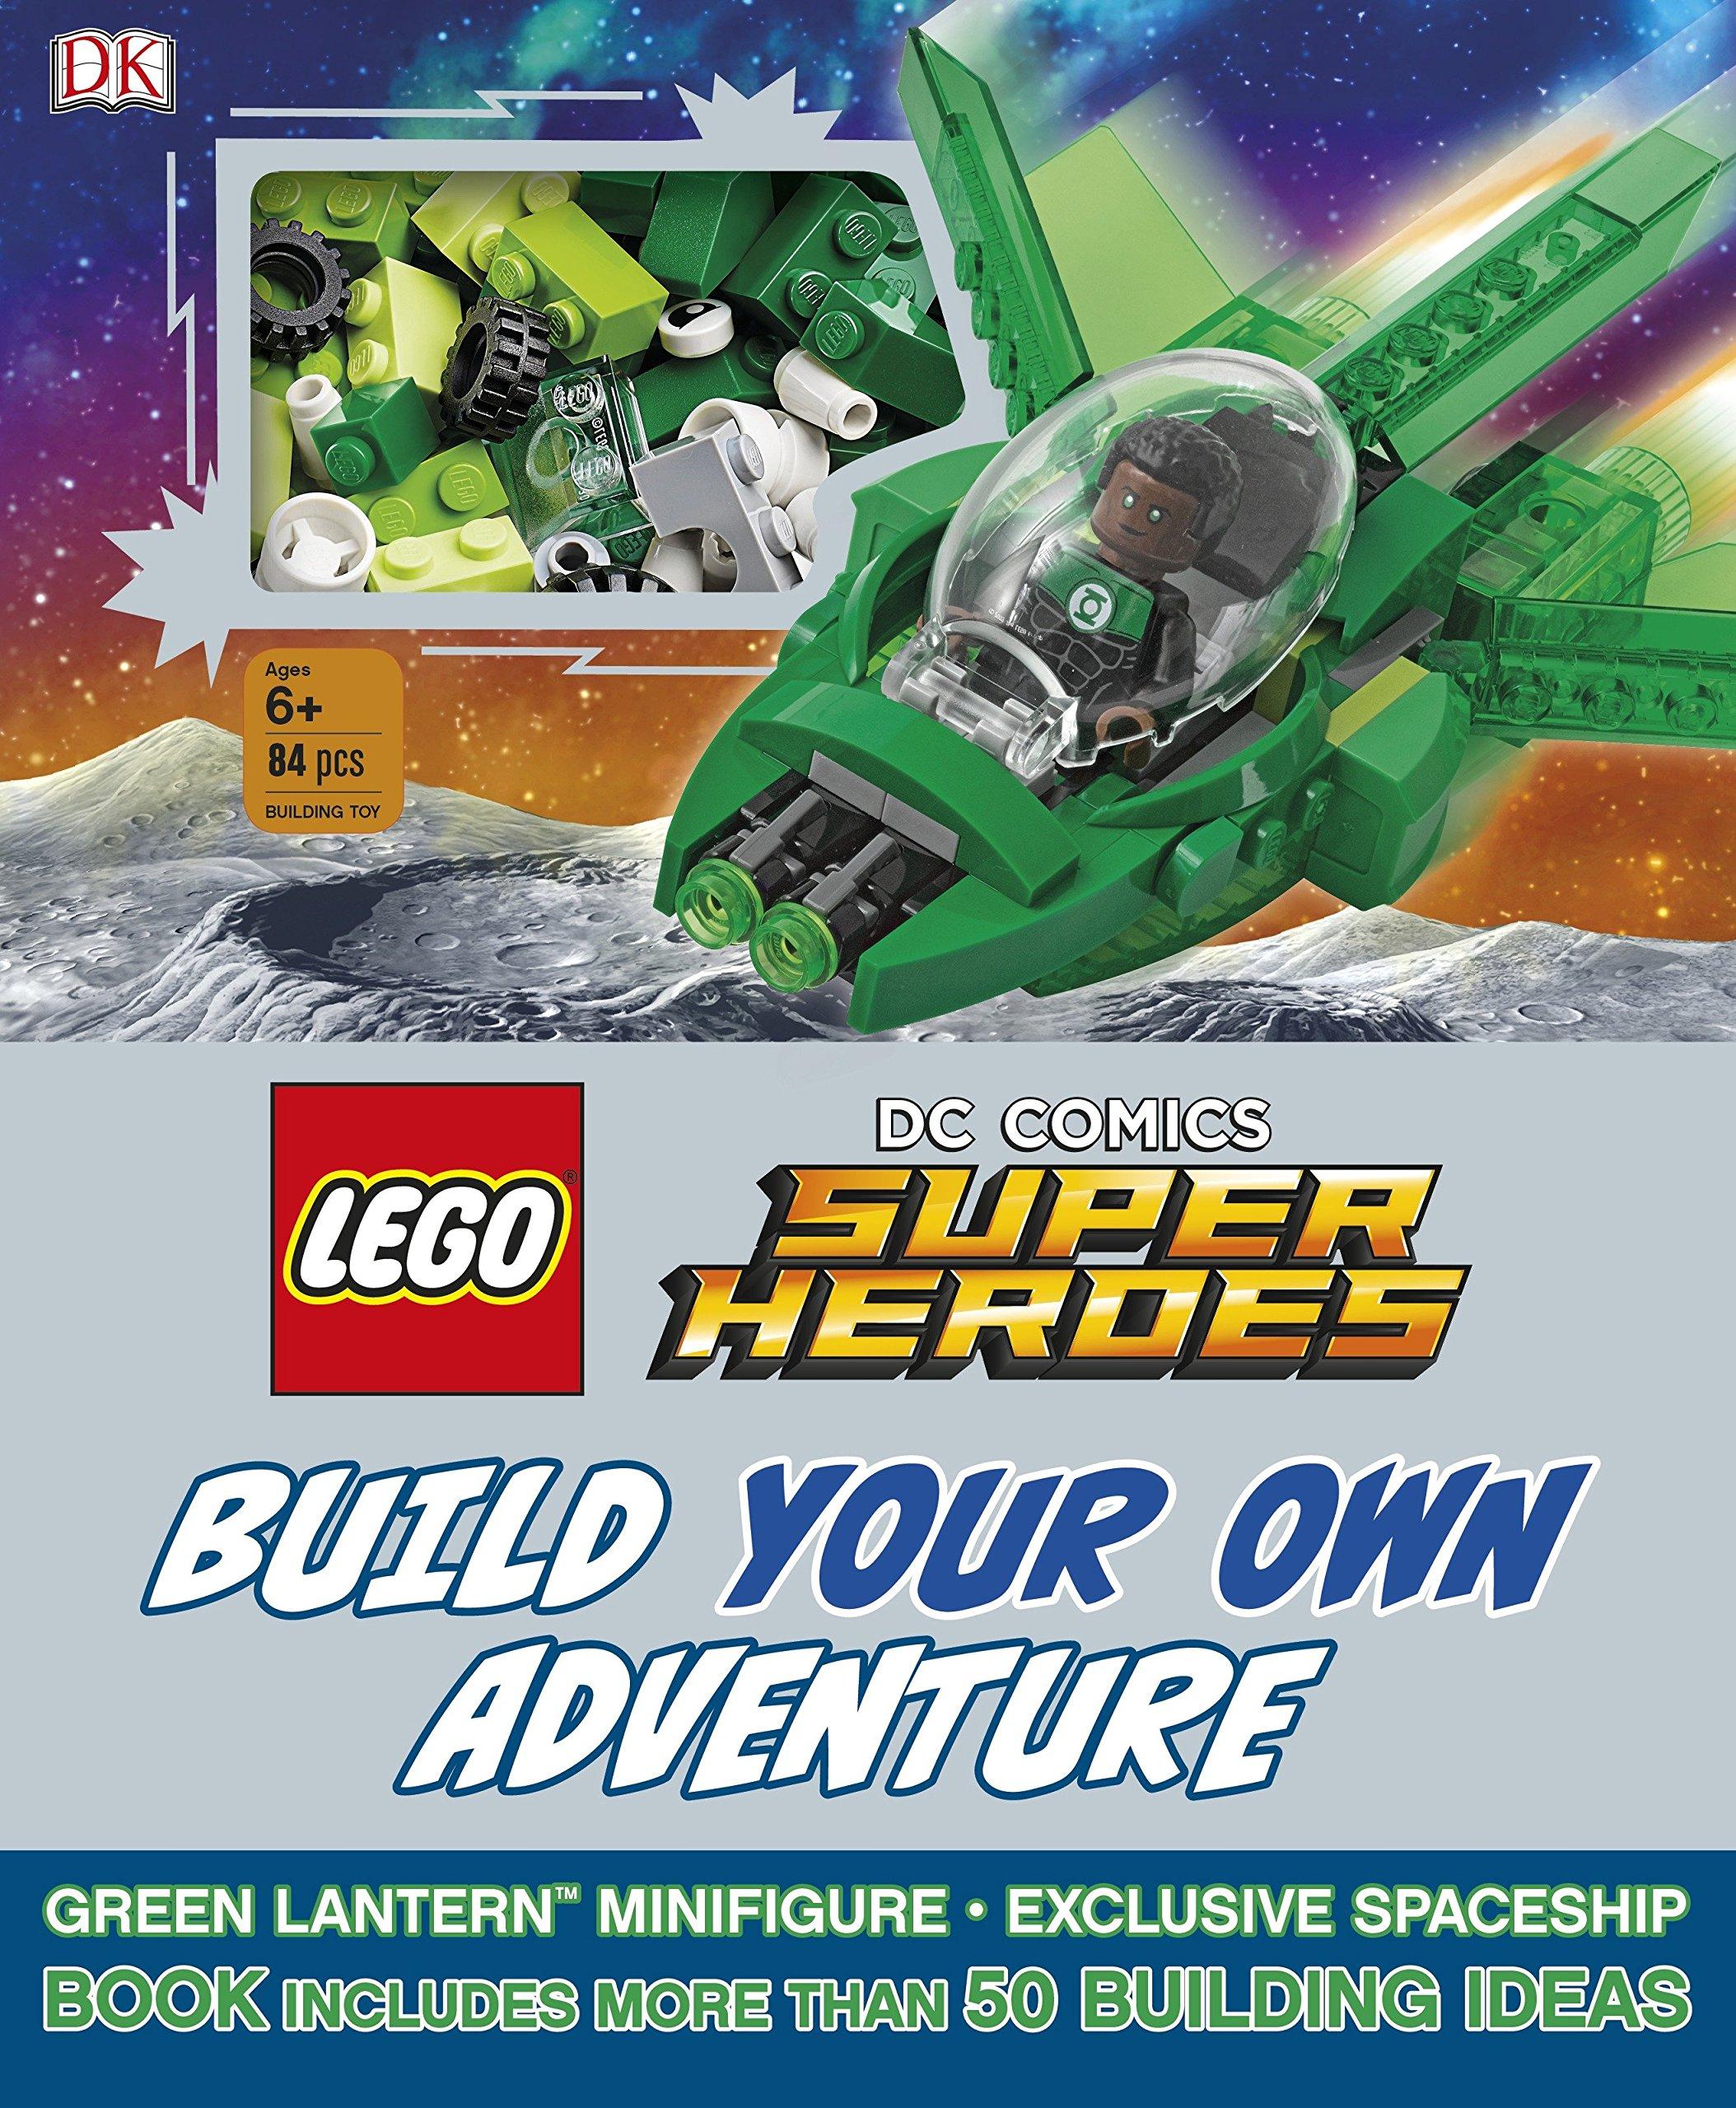 LEGO DC Comics Super Heroes: Build Your Own Adventure